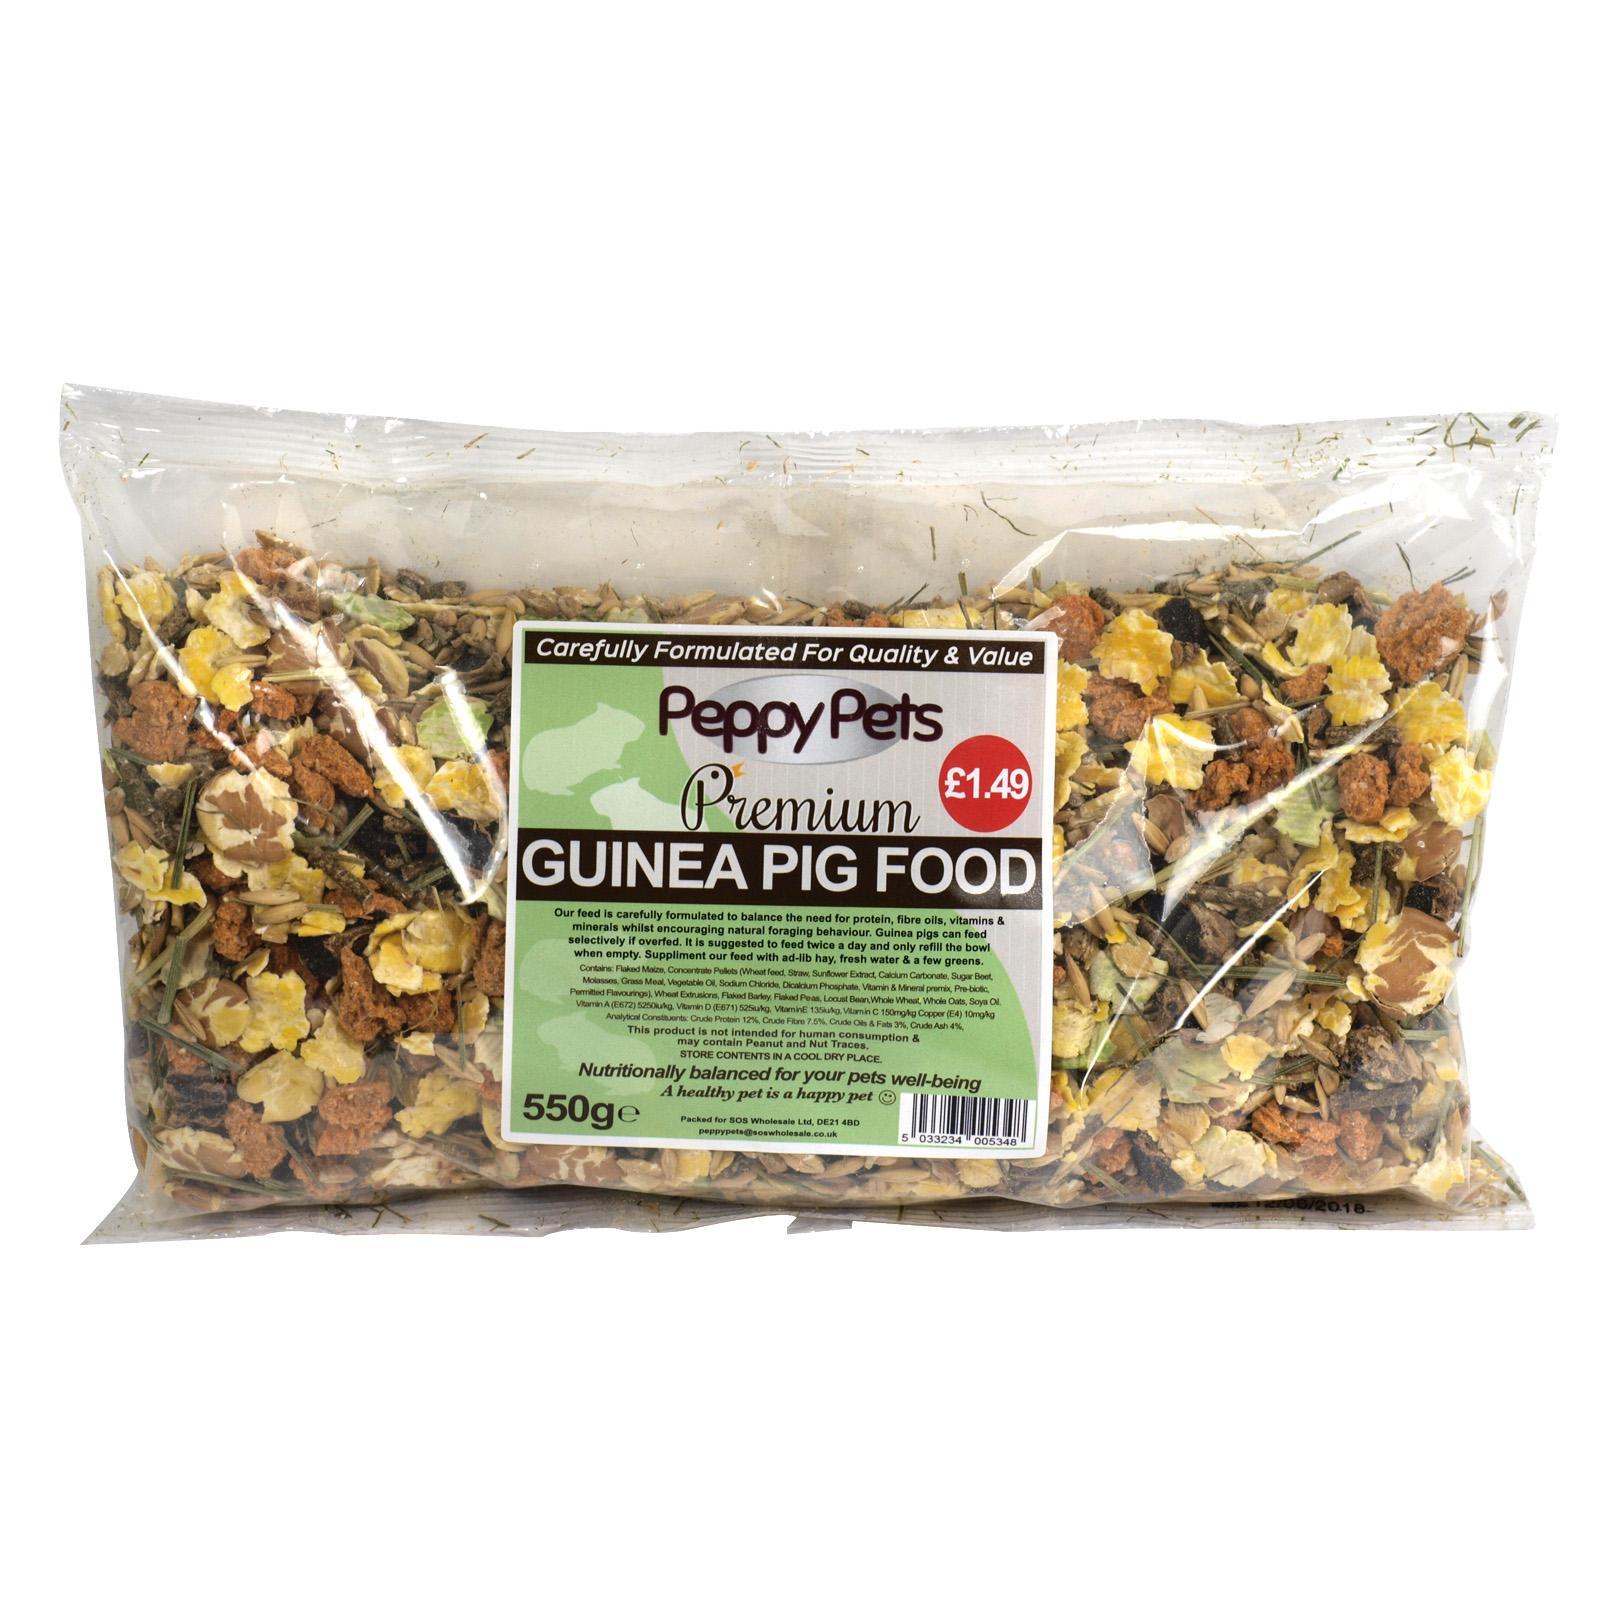 PEPPY PETS GUINEA PIG FOOD PM?1.49 550GM